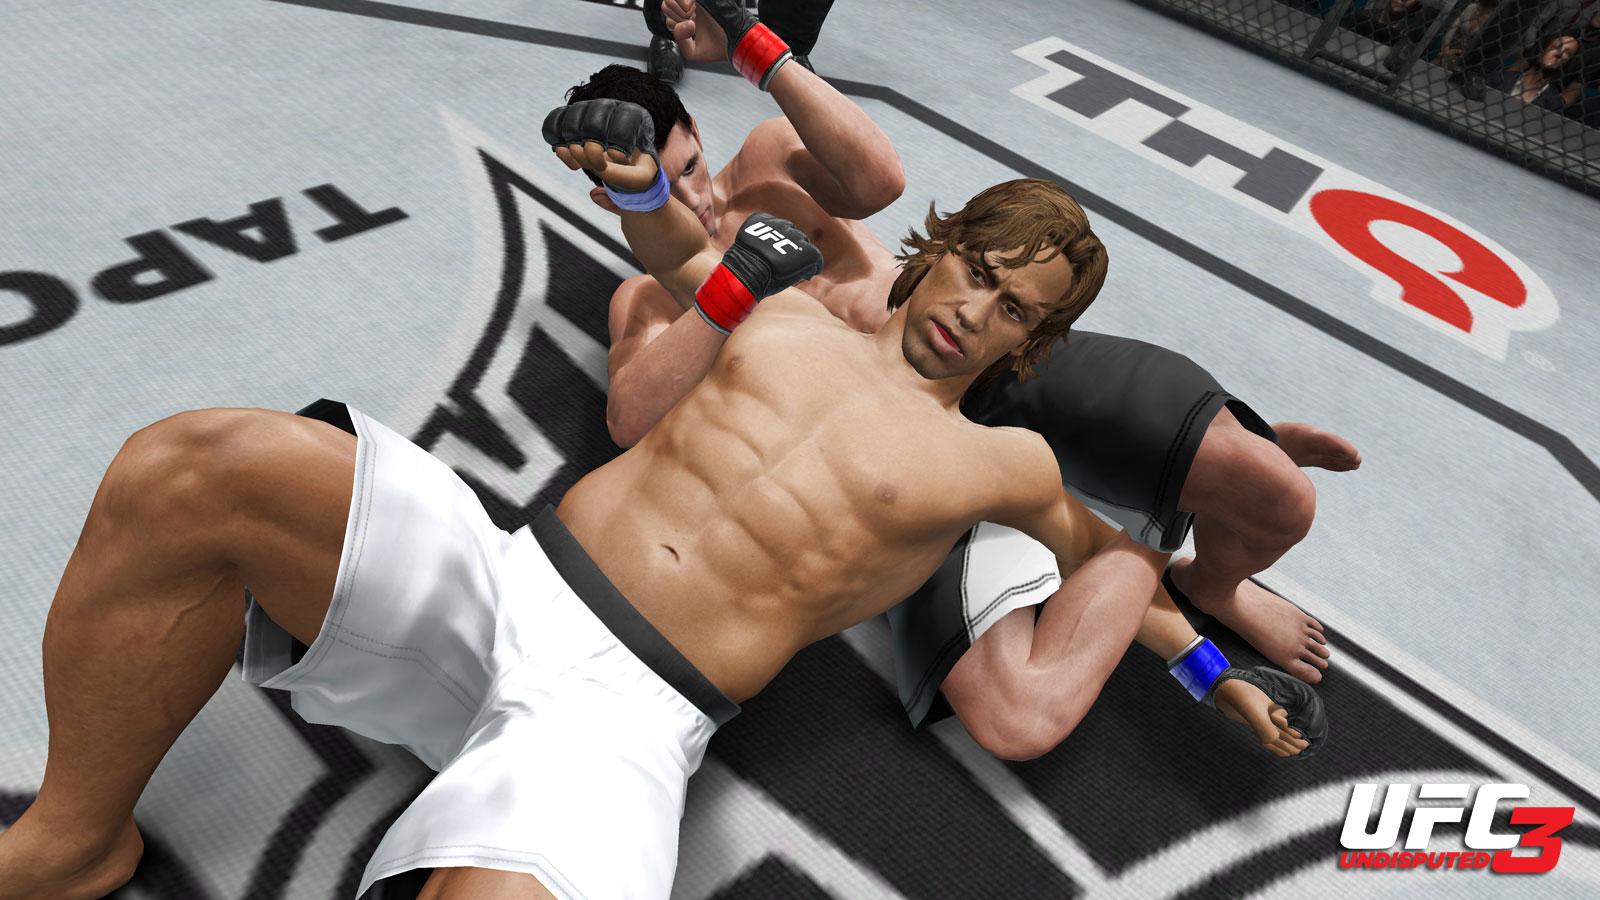 Power Torrent Games: UFC Undisputed 3 [MULTI][FW 4.01][PS3]Ufc Undisputed 4 Ps3